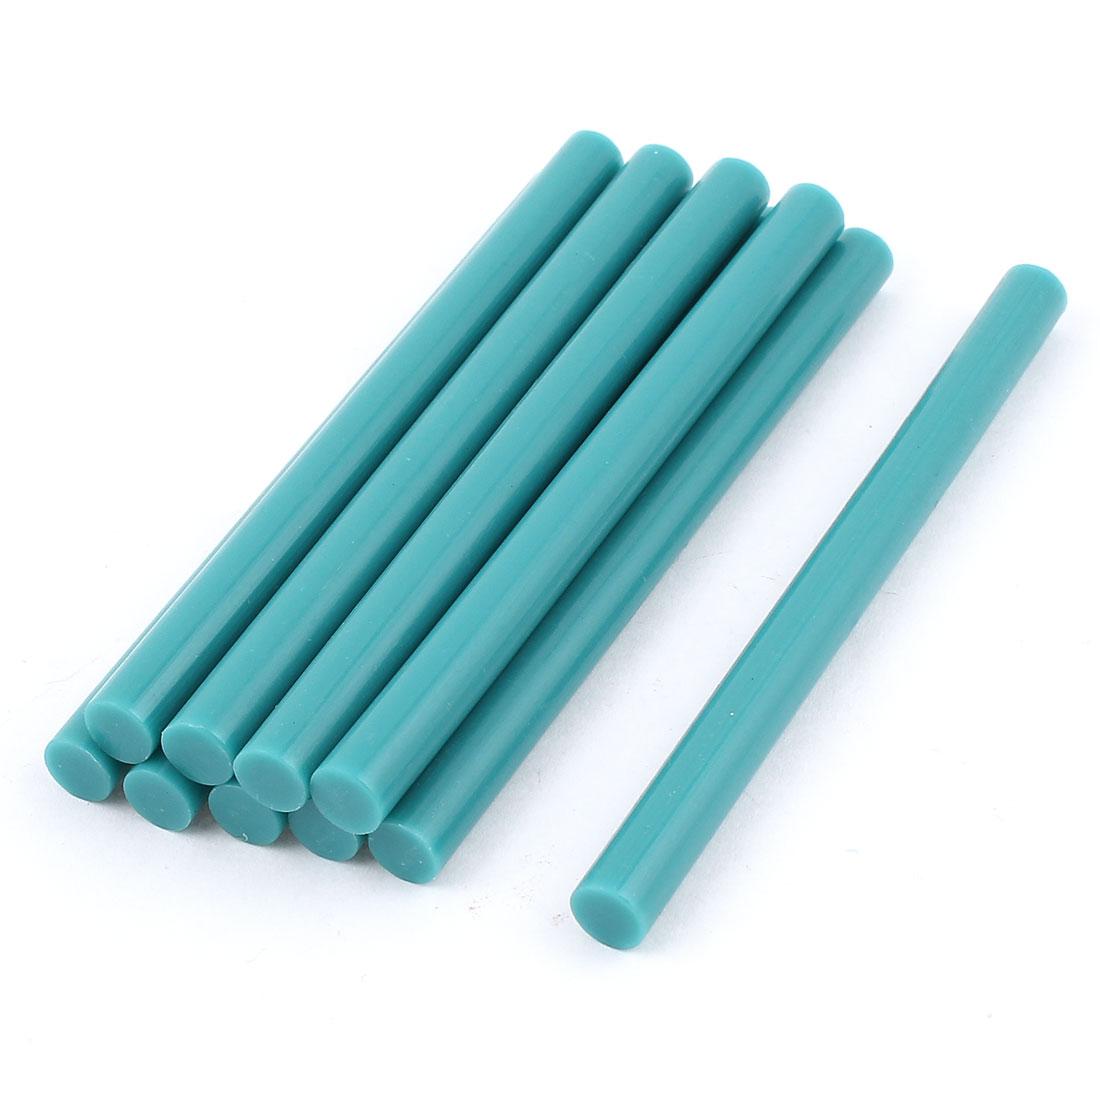 10 Pcs Teal Blue Hot Melt Glue Gun Adhesive Sticks 7mm x 100mm